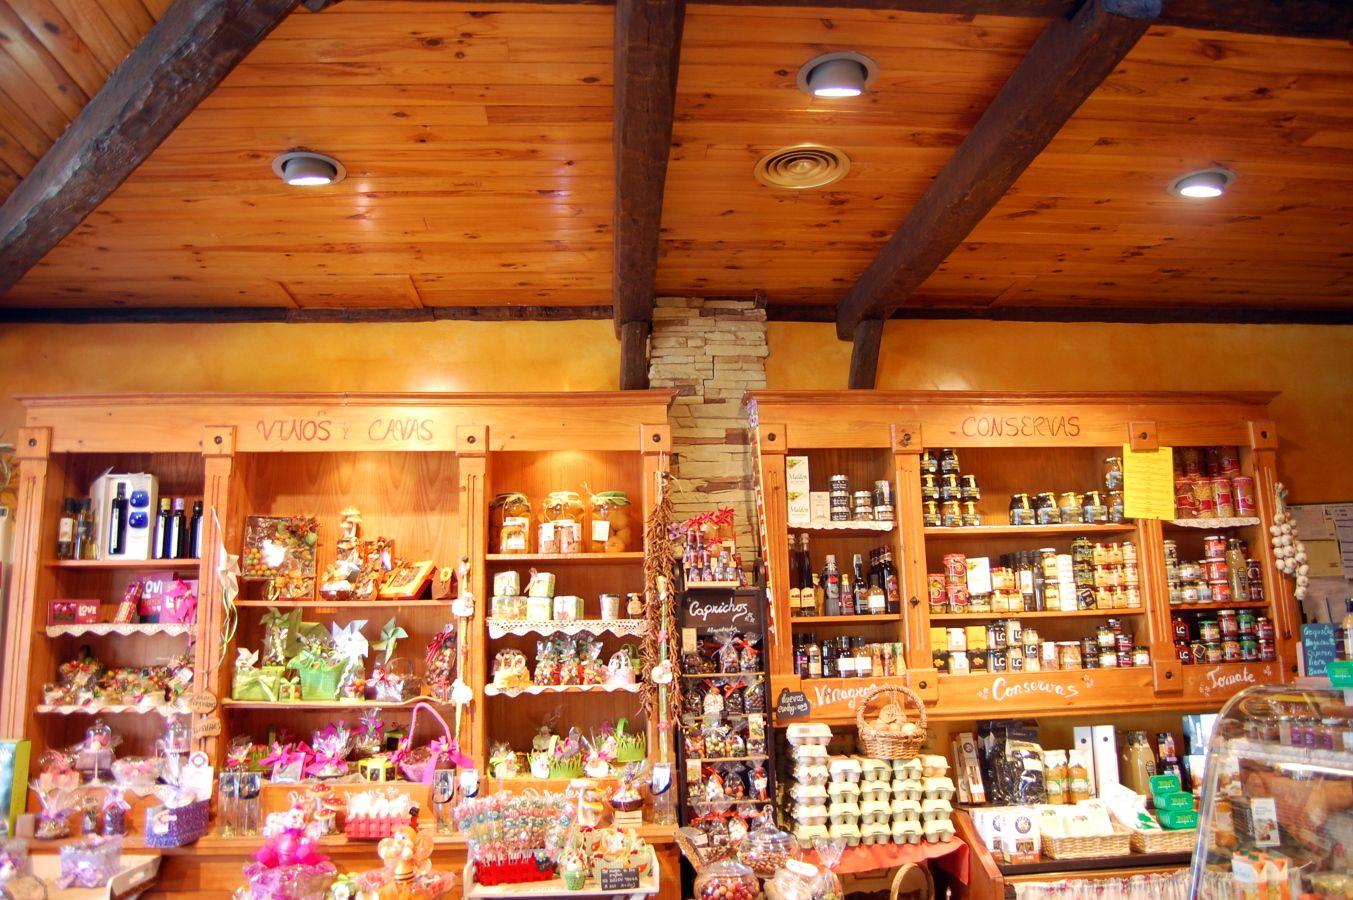 fruteria iluminacion | Ideas alimentación | coffee shops | vinotecas ...